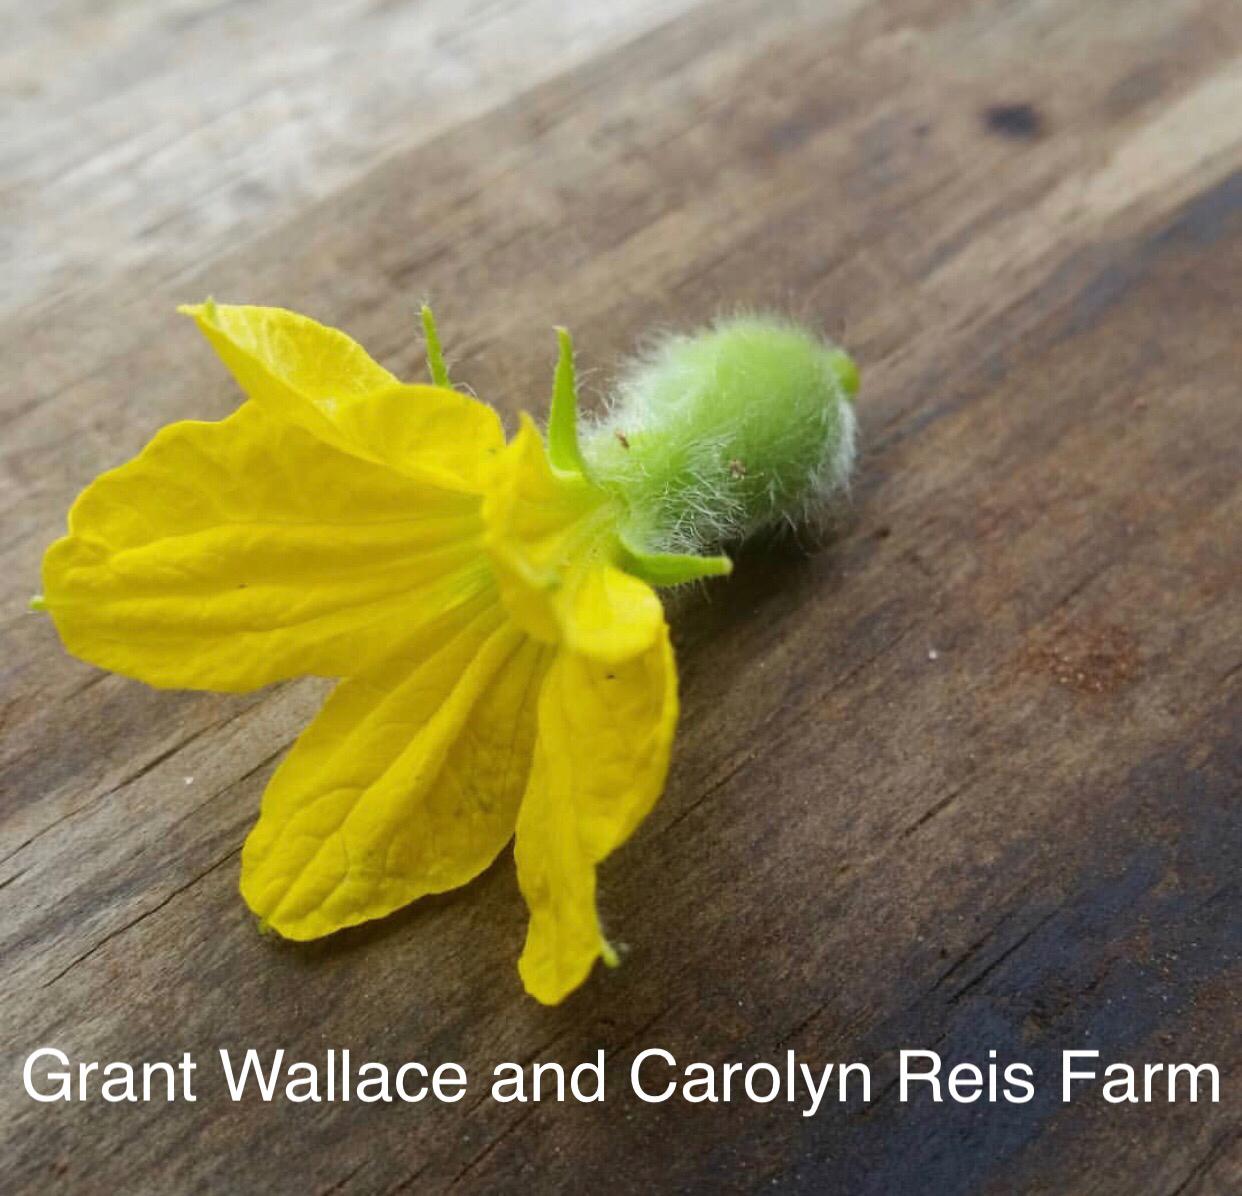 Grant Wallace and Carolyn Reis Farm